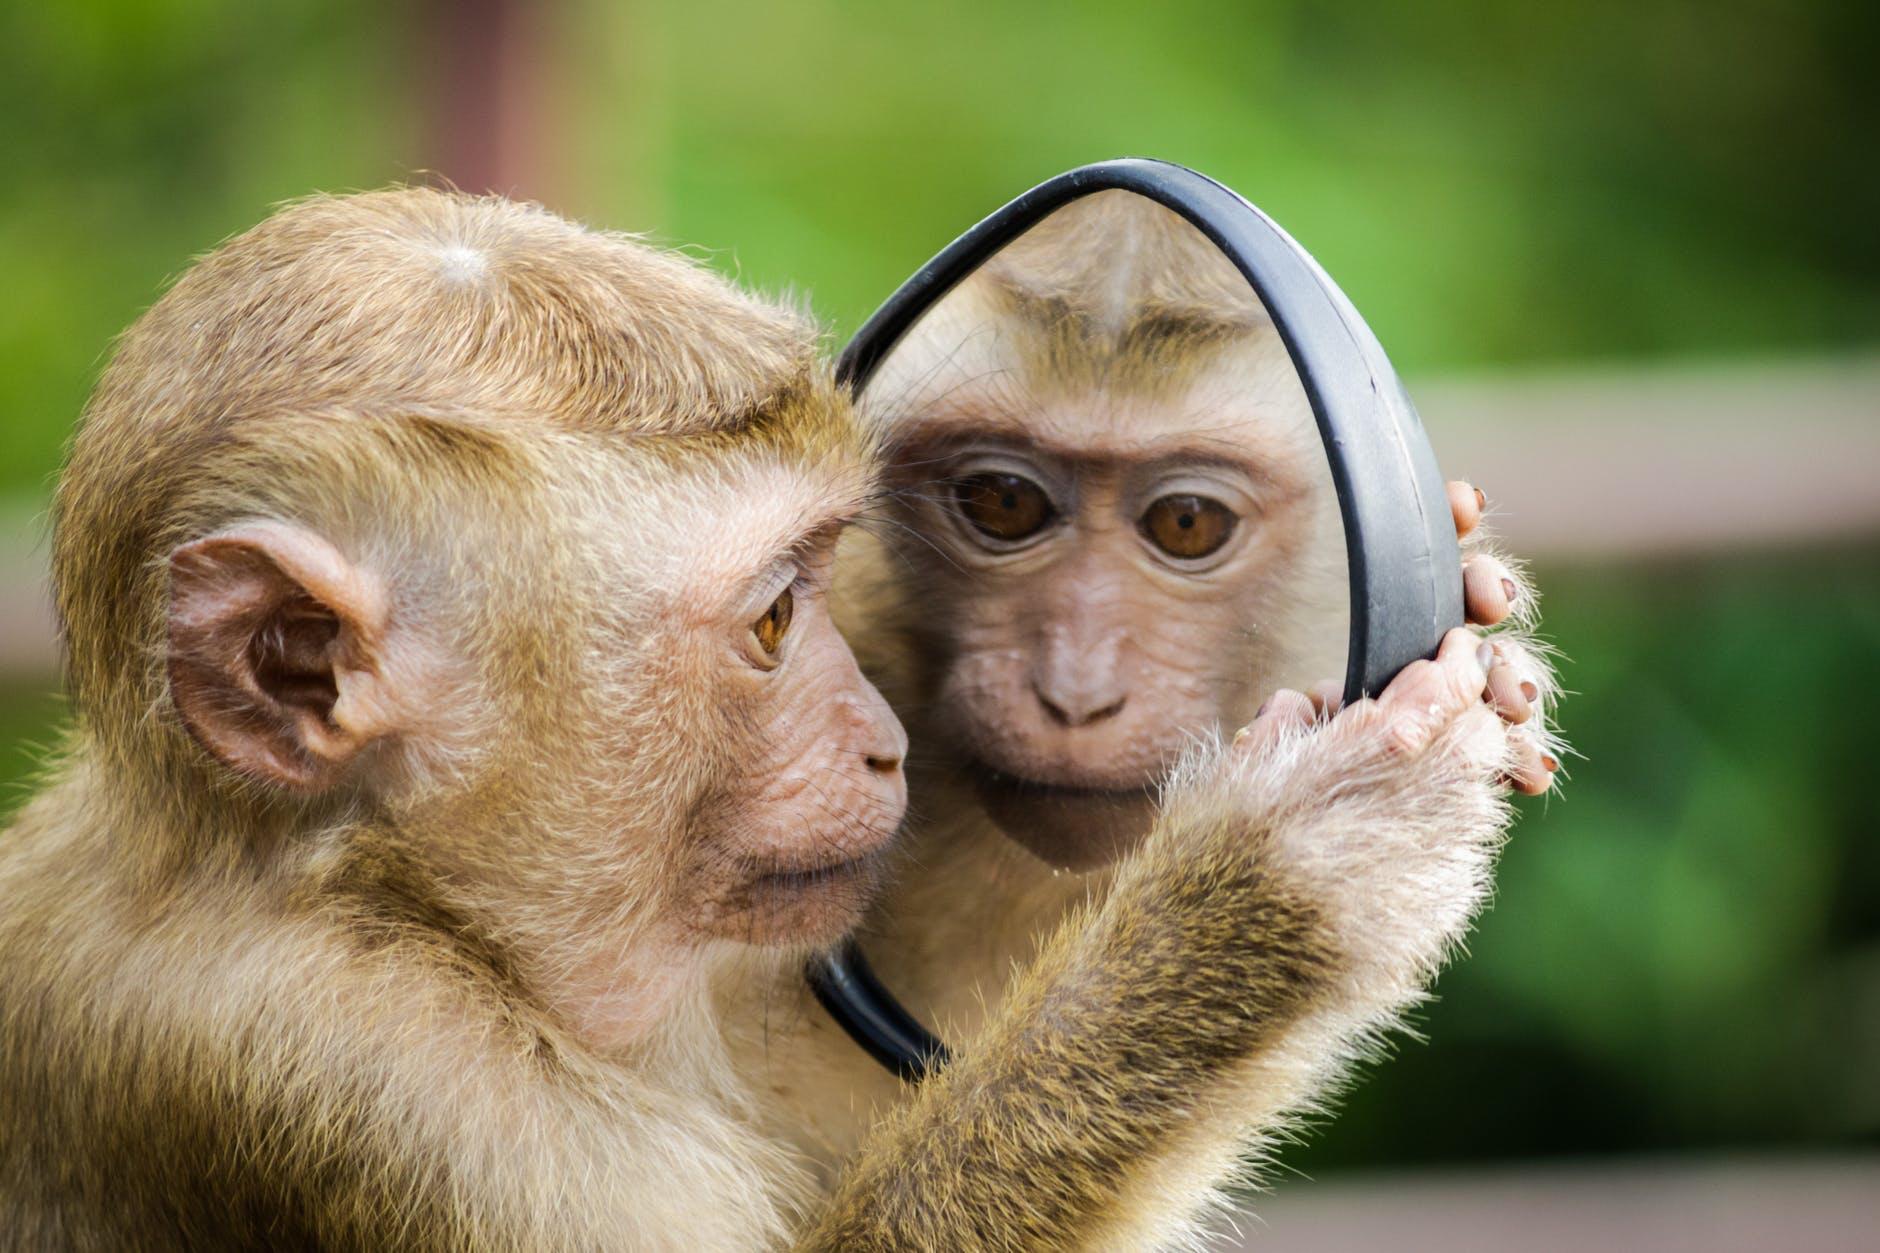 Monkey looks in the mirror